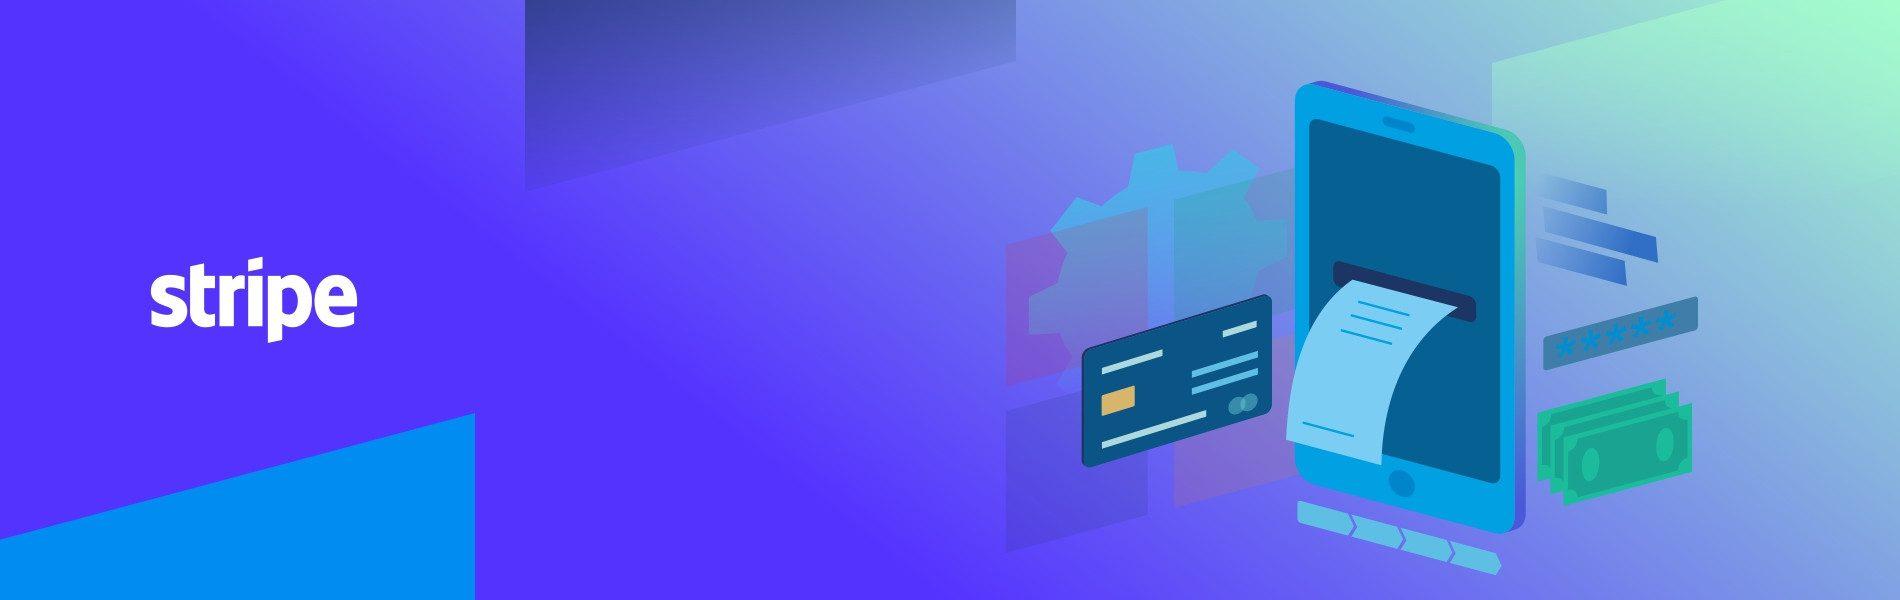 Blog Header Stripe Payment In ASP.NET MVC 1900×600